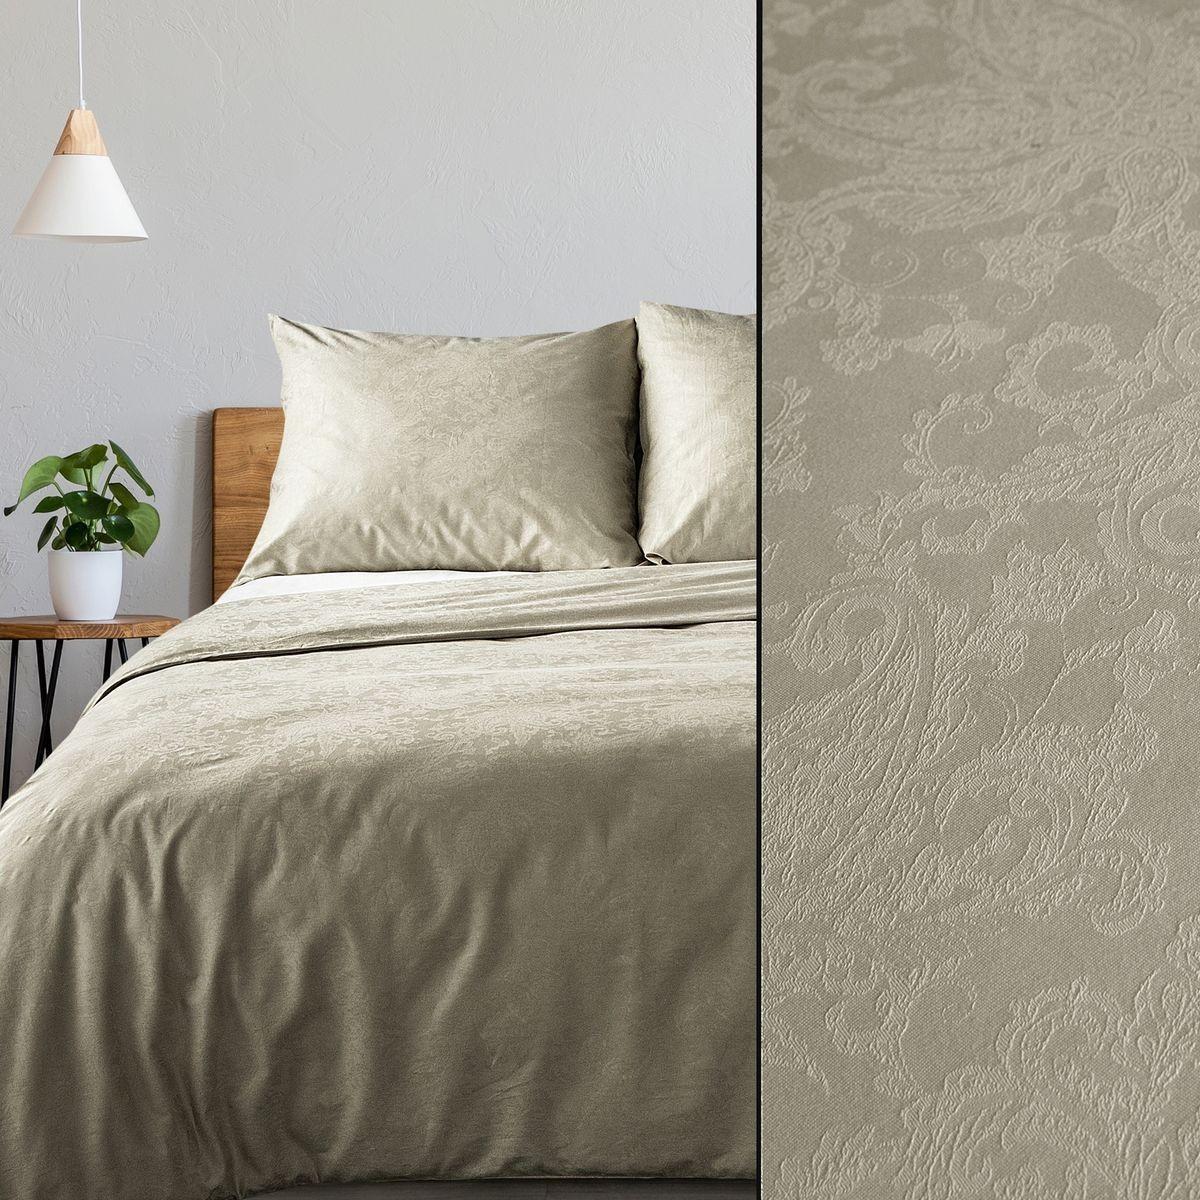 DomTextilu Luxusné béžové damaškové posteľné obliečky s kvetinovou štruktúrou 3 časti: 1ks 200x220 + 2ks 70x80 Béžová 3 časti: 1ks 200x220 + 2ks 70x80 44500-208127